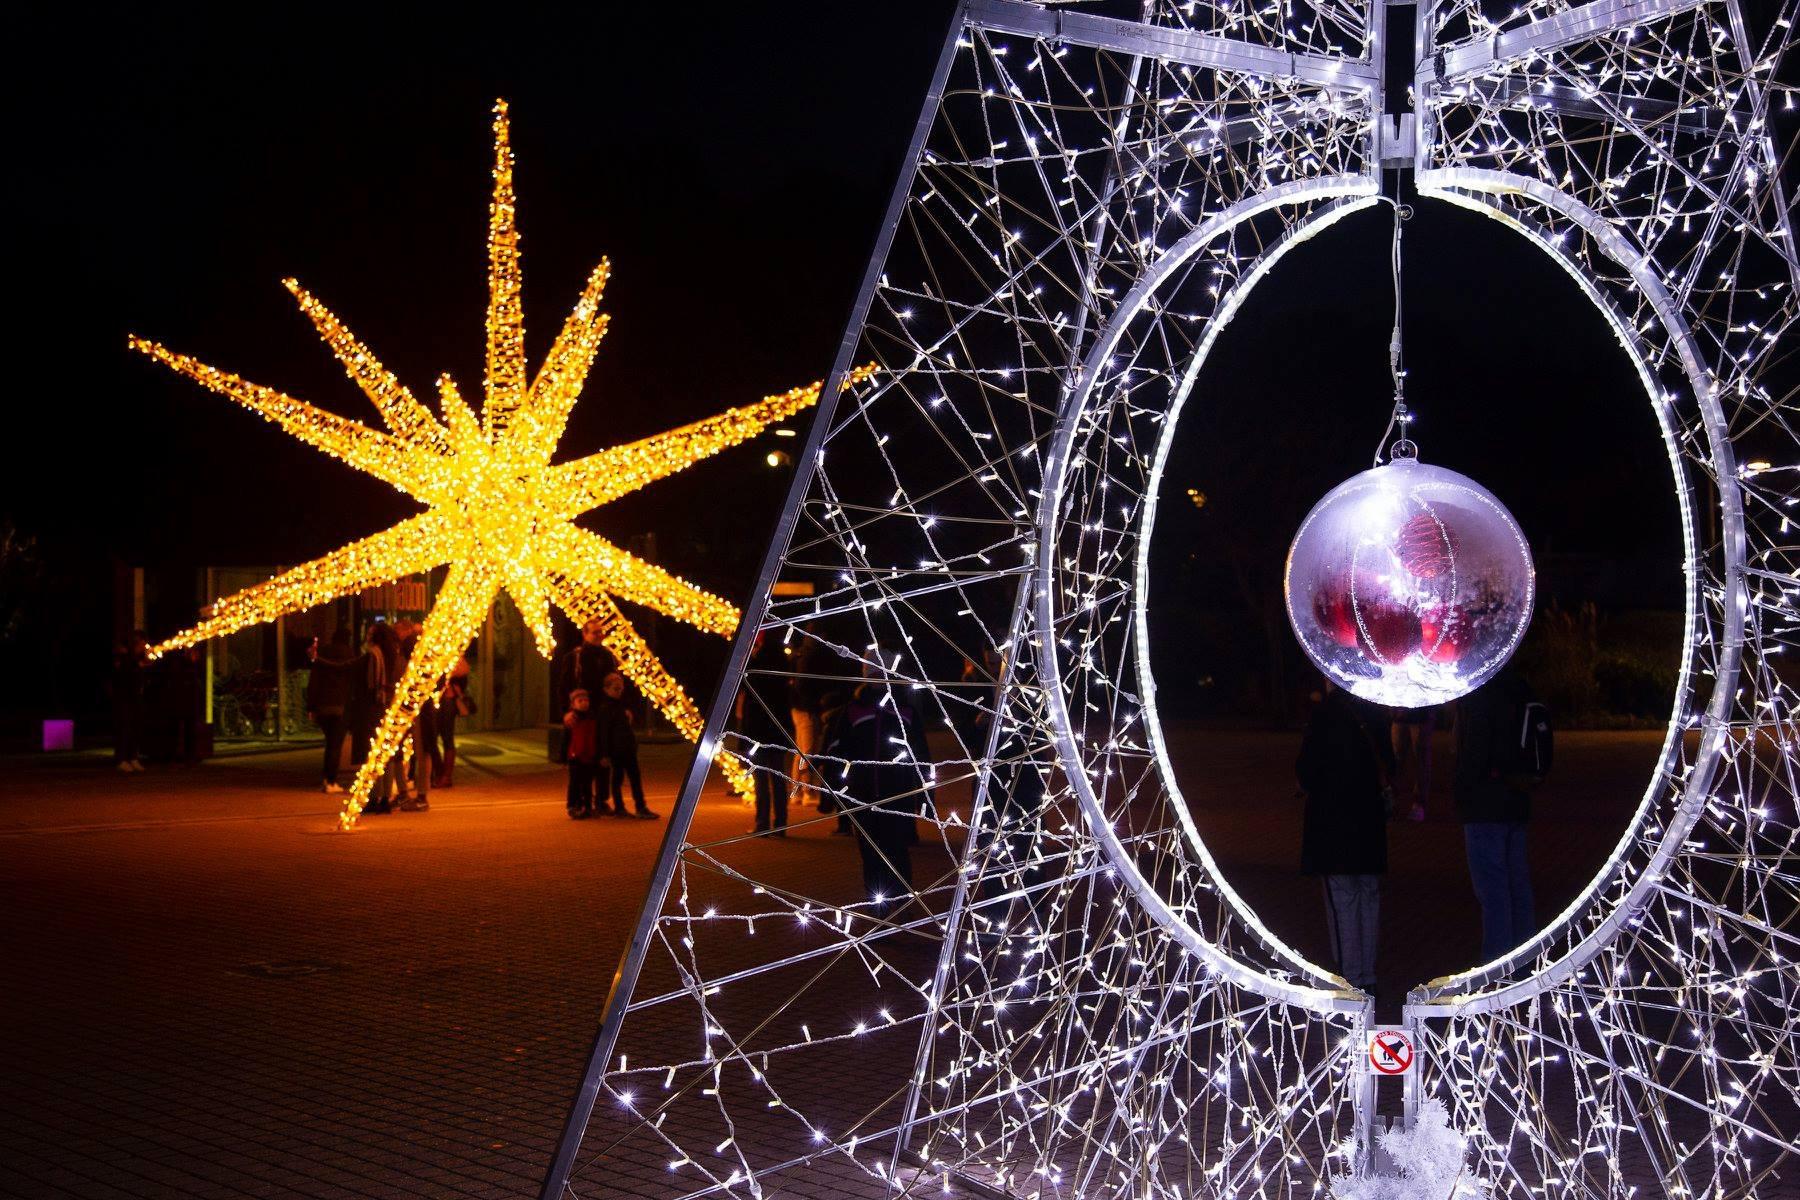 FuturoNoël – Noël 2018 du 22/12 au 06/01/2019 8-E147099-ADC4-452-C-A44-C-FB525-CE8-D9-EF